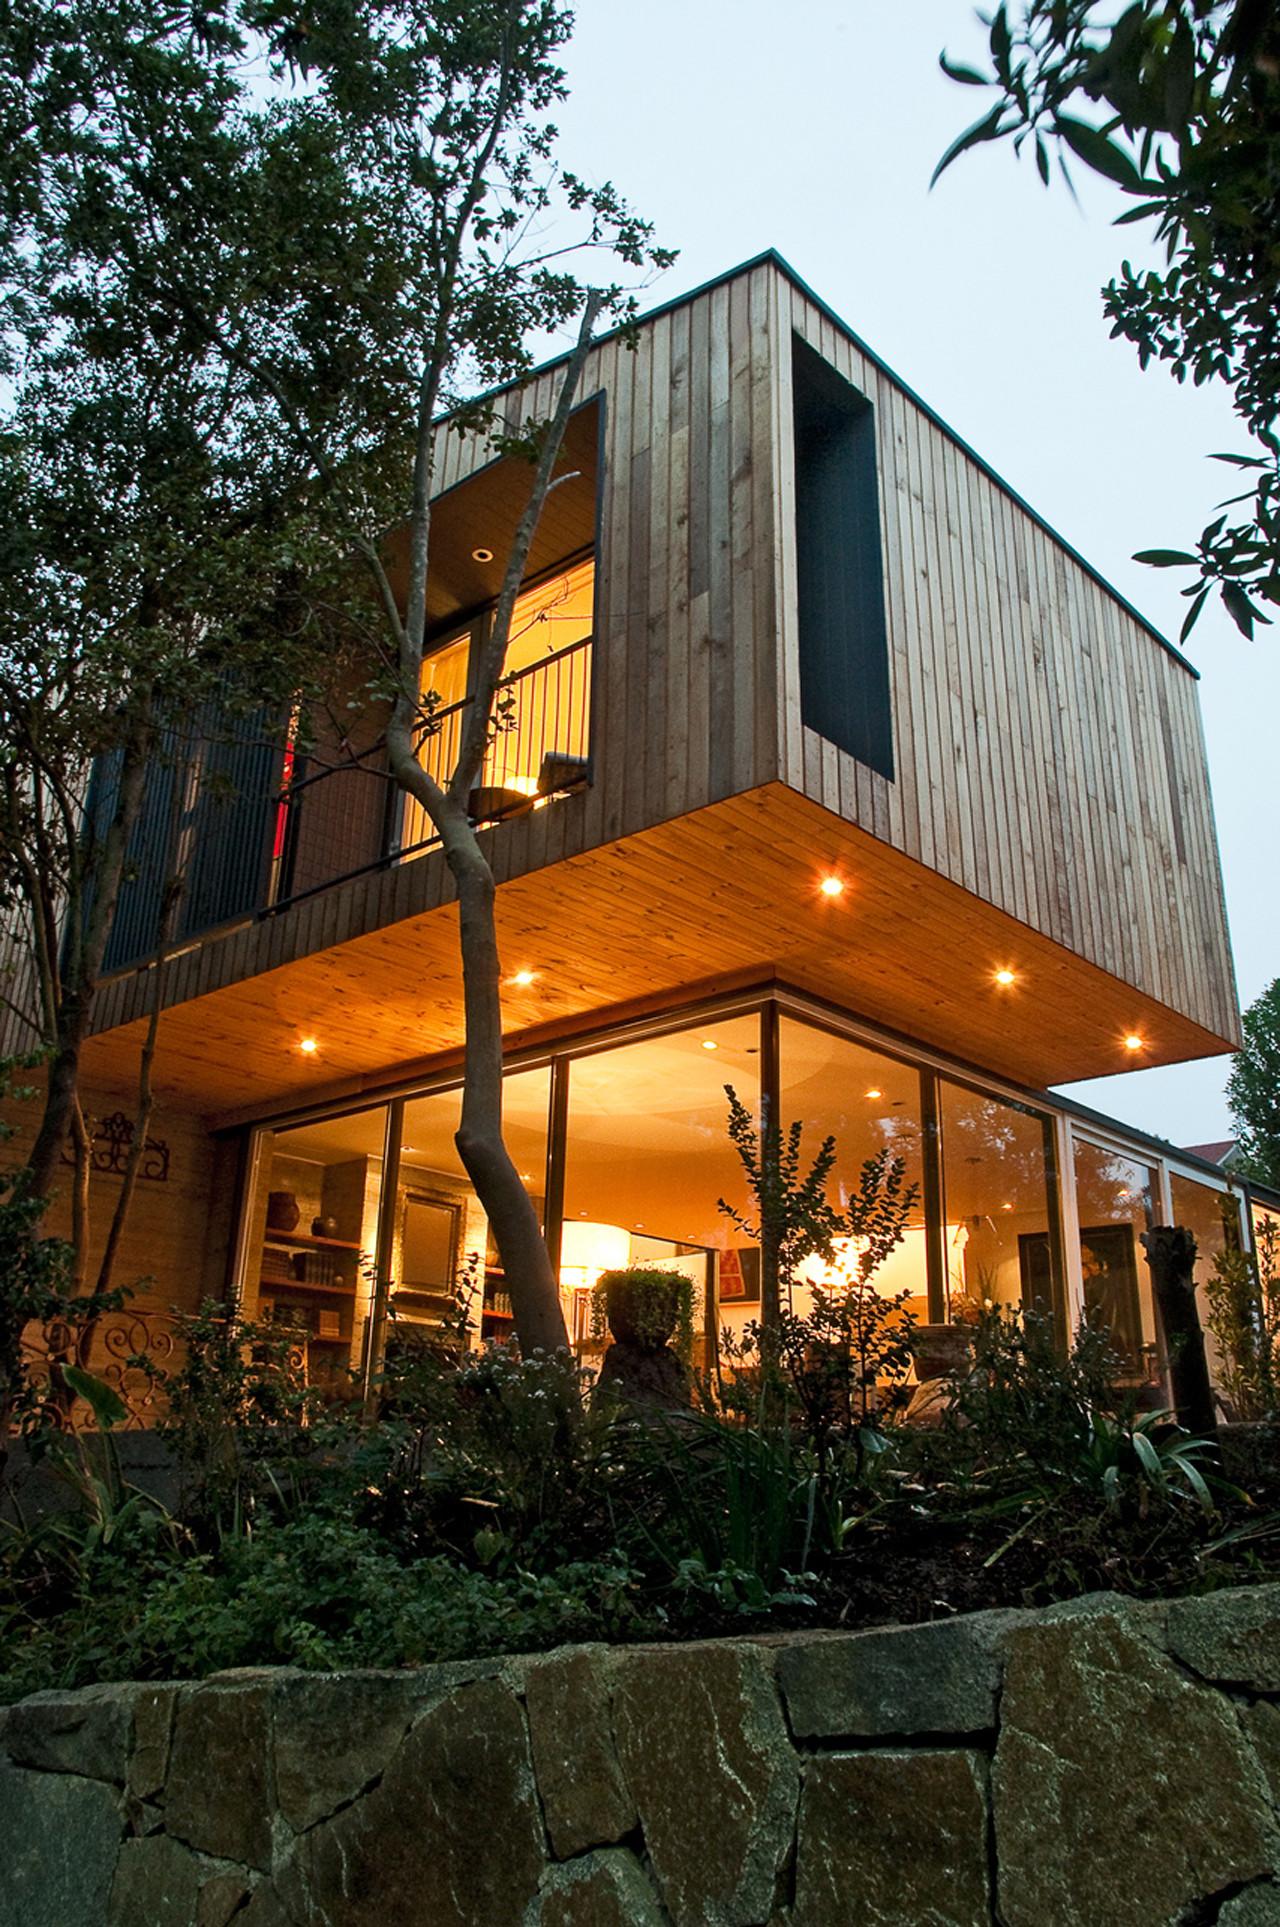 Hotel Casa Zapallar / ADG Arquitectos, © Felipe Trucco